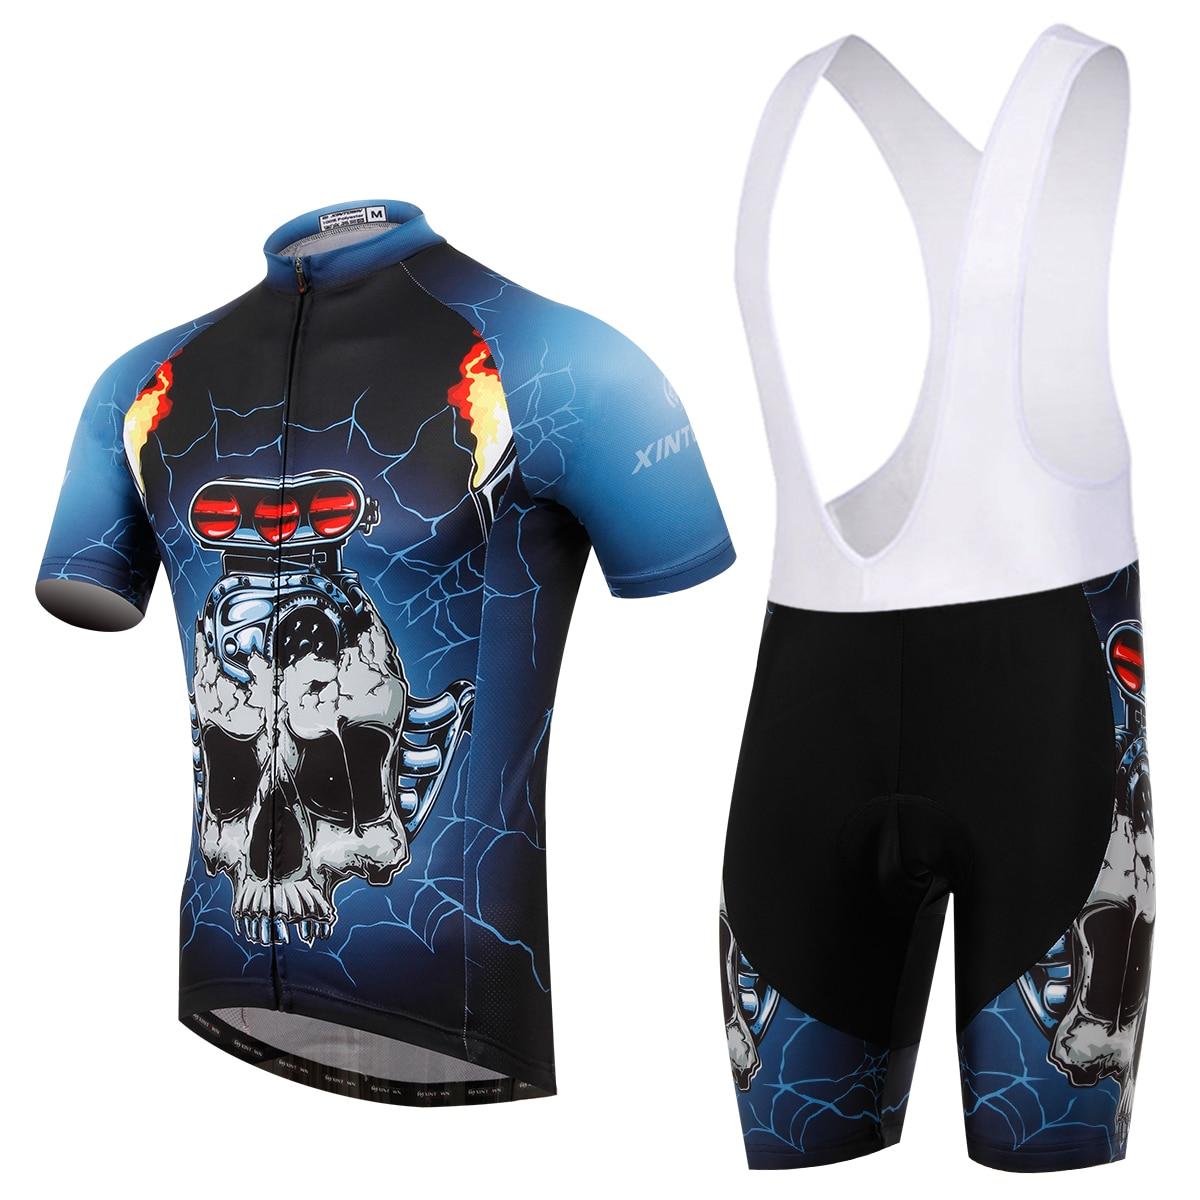 Cycling clothing bike jersey mountain bicycle clothes for Craft mountain bike clothing